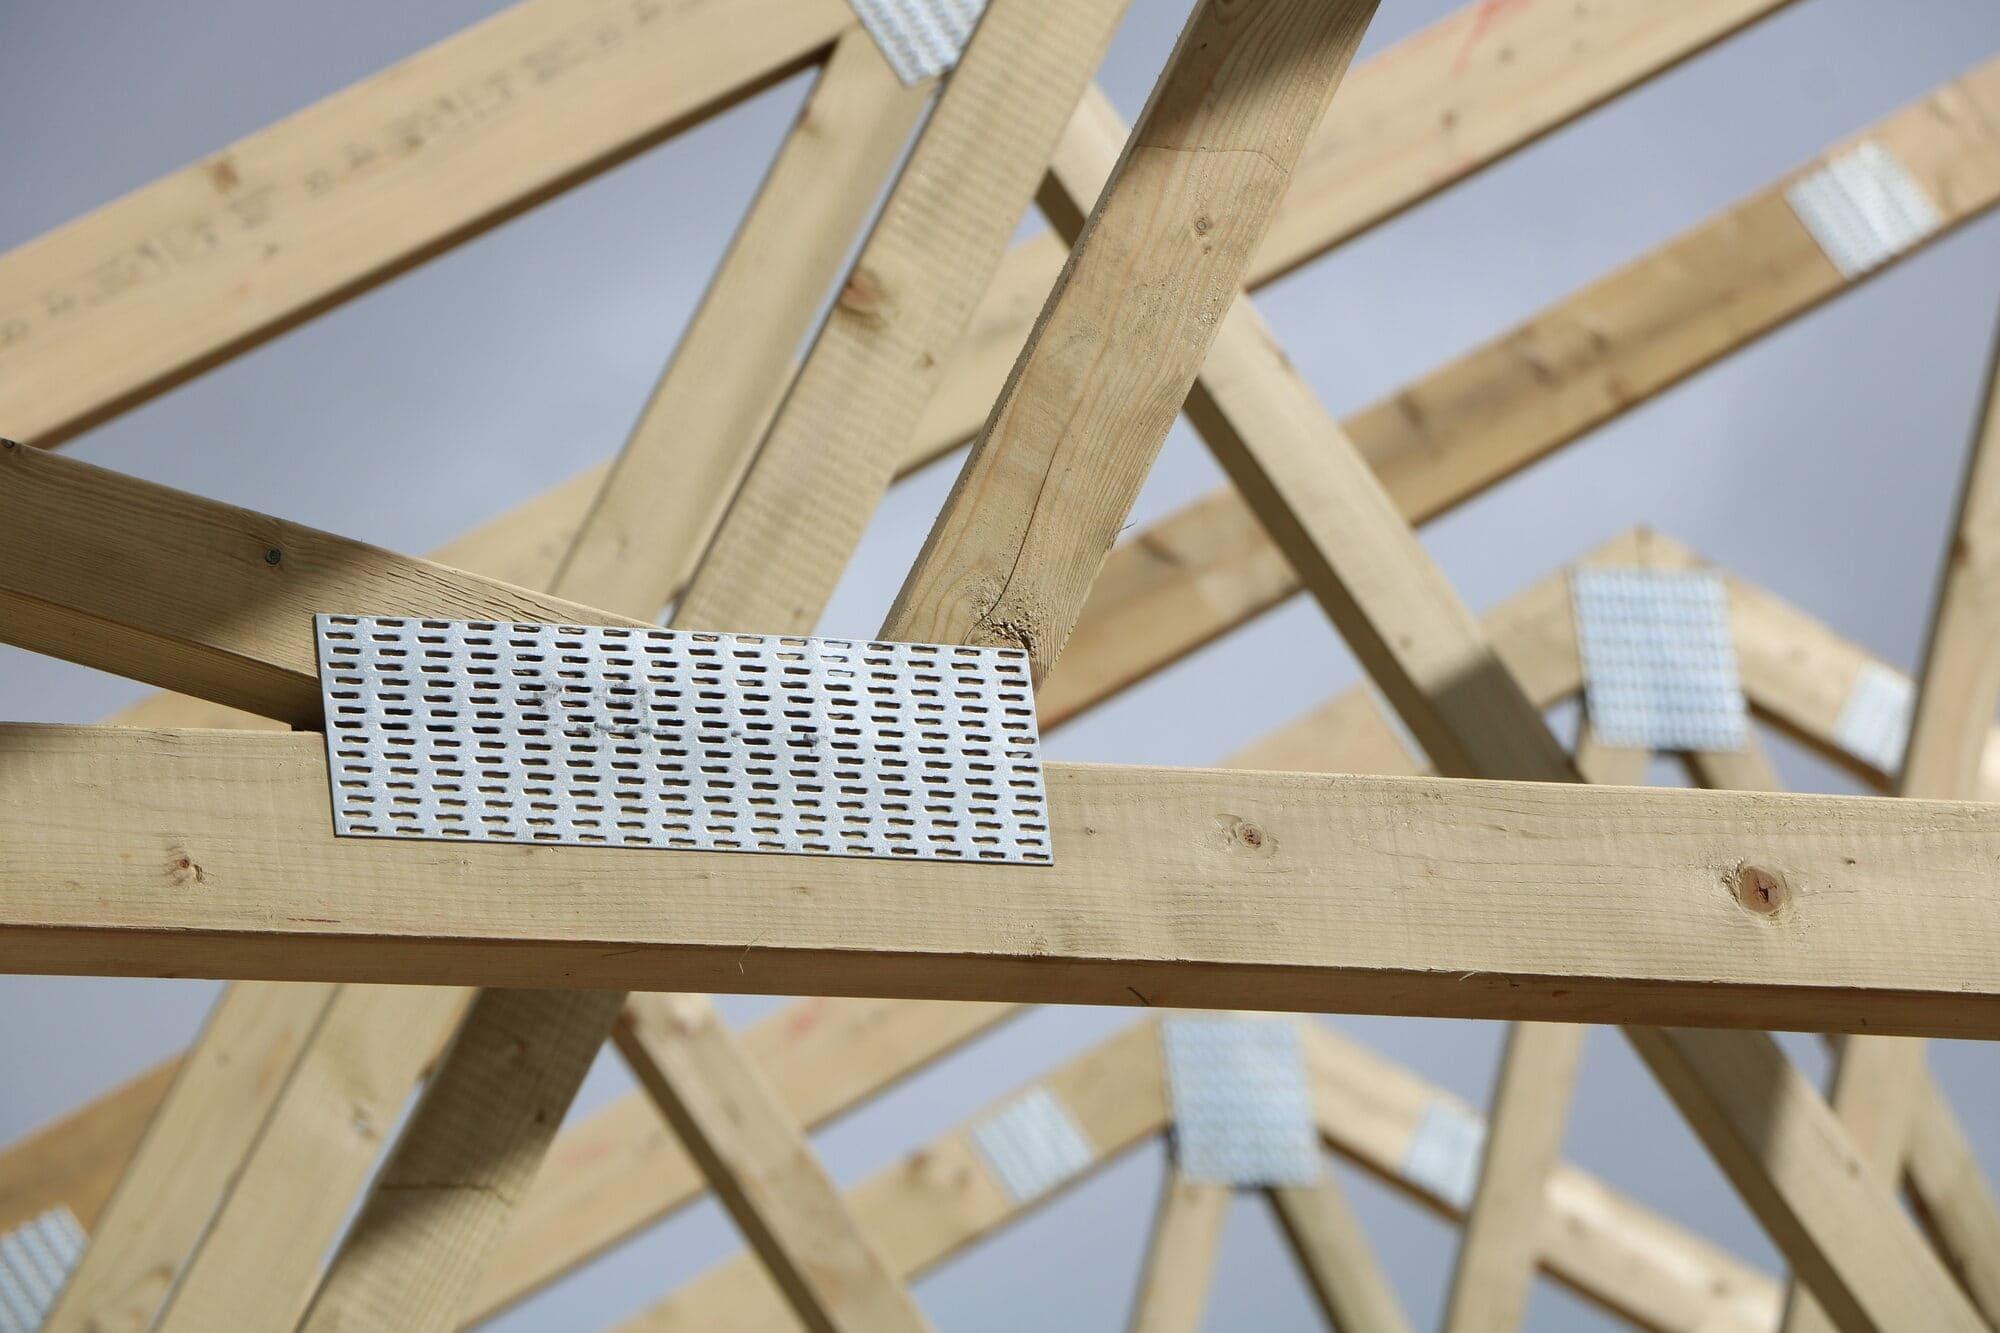 medinės šynos naudojant Mitek jungčių plokšteles